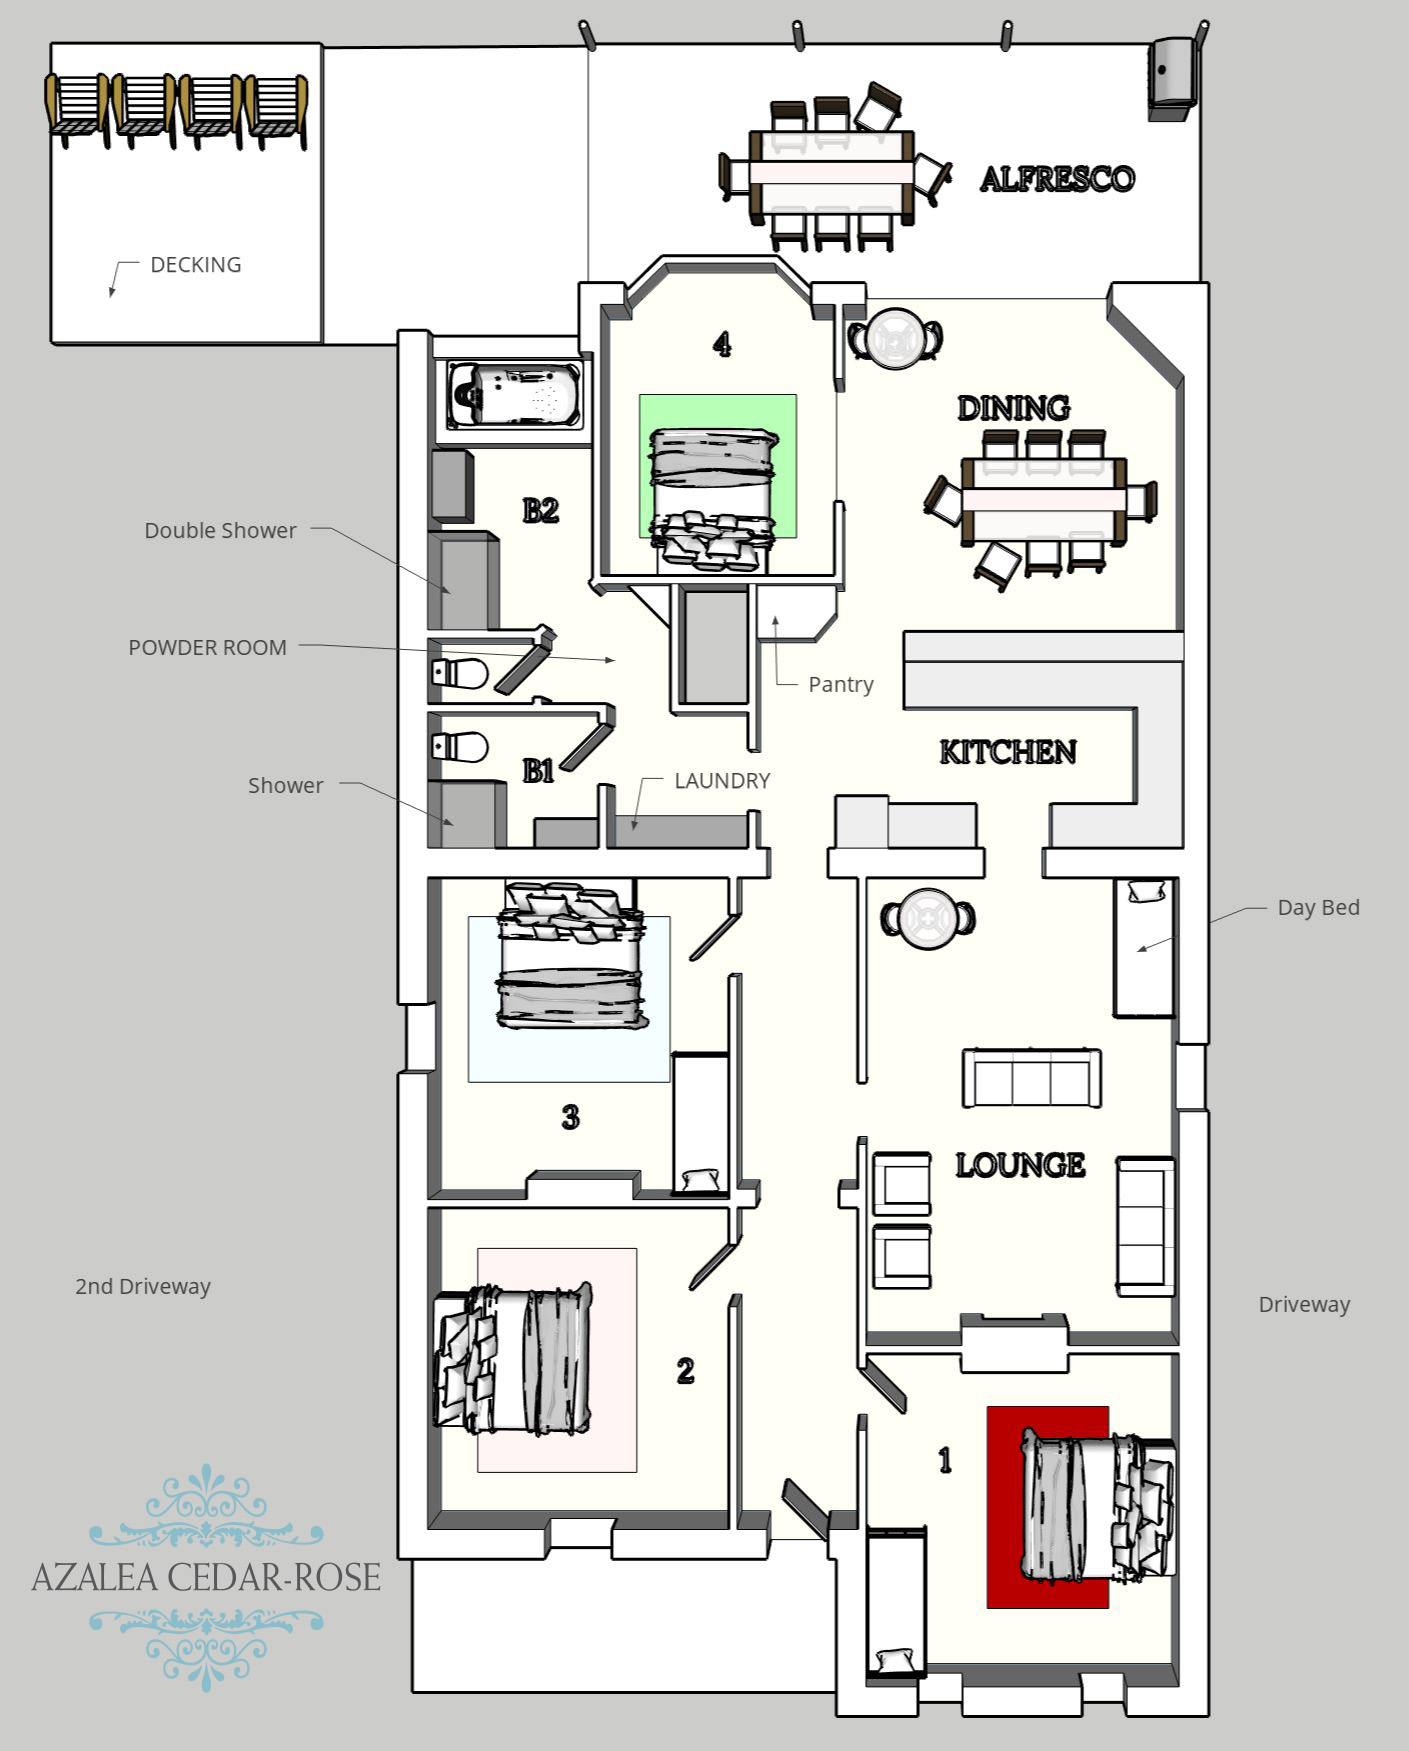 3D Azalea Cedar-Rose Villa Floorplan